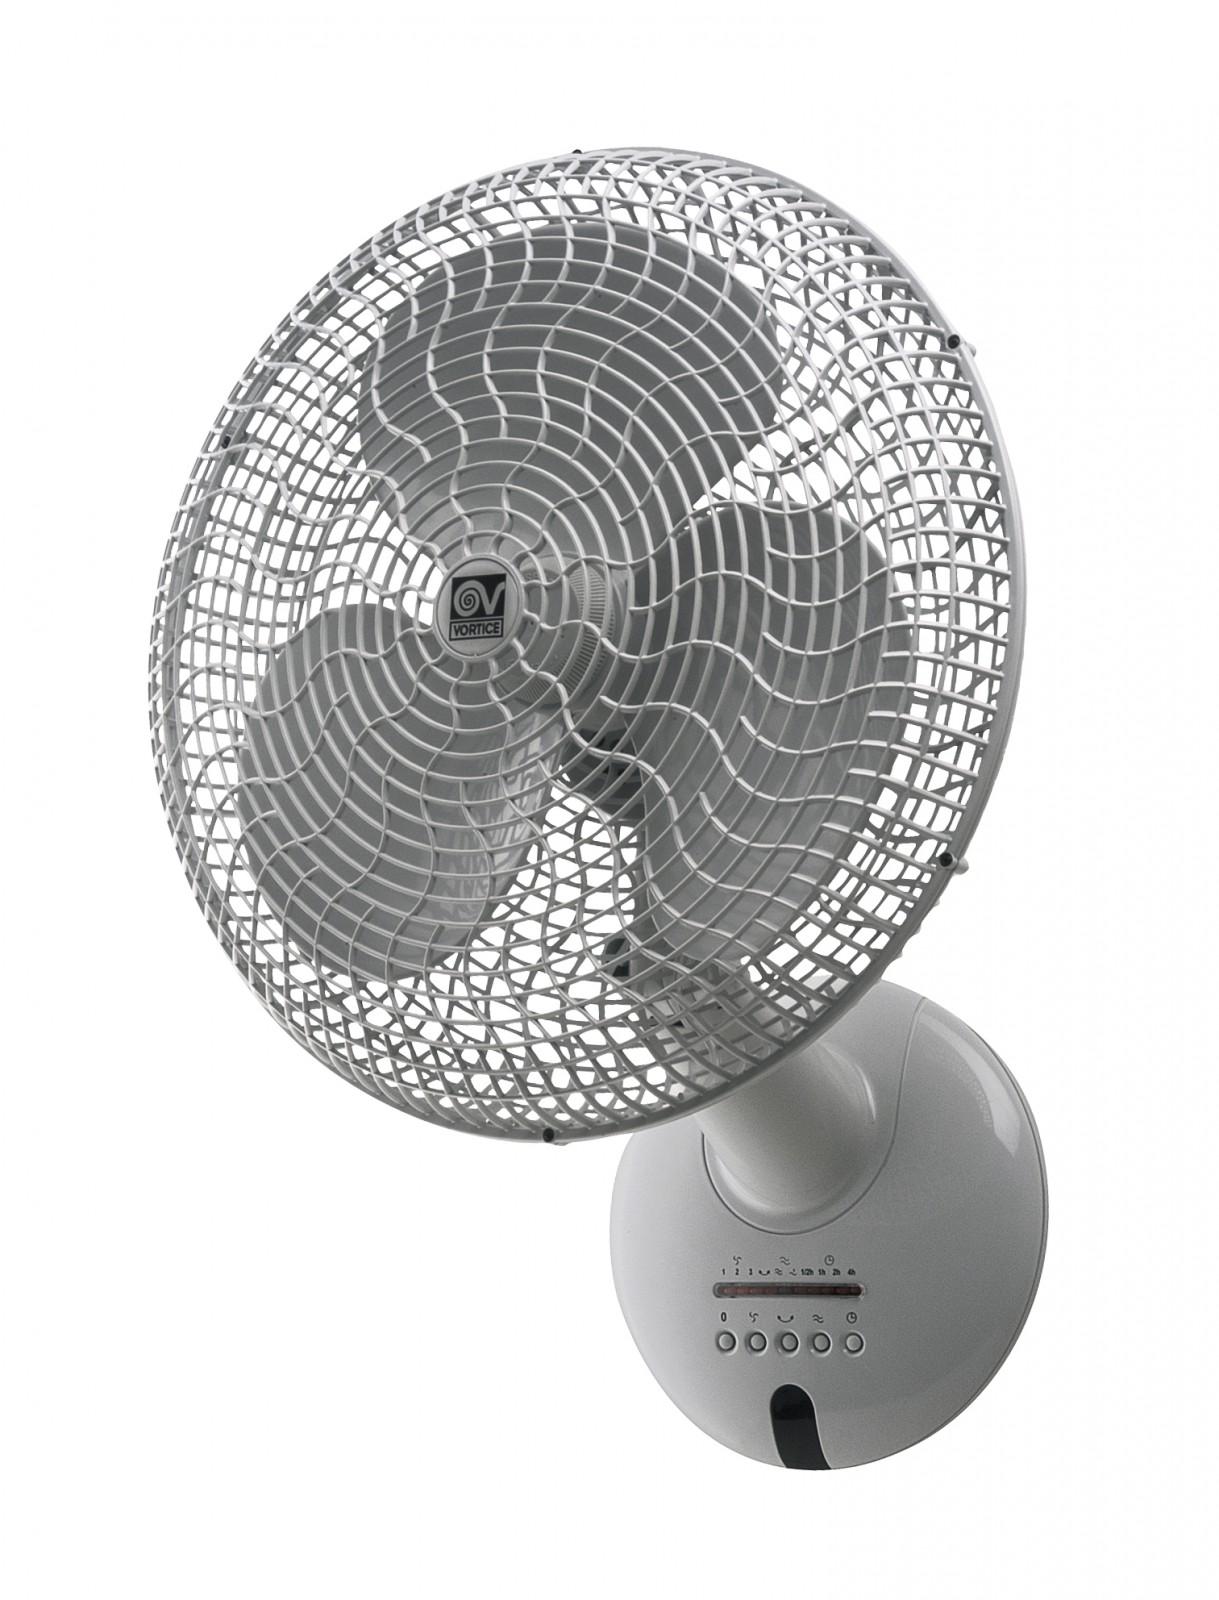 Vortice ventilatore da parete gordon w grigio chiaro in - Ventilatore da parete ...